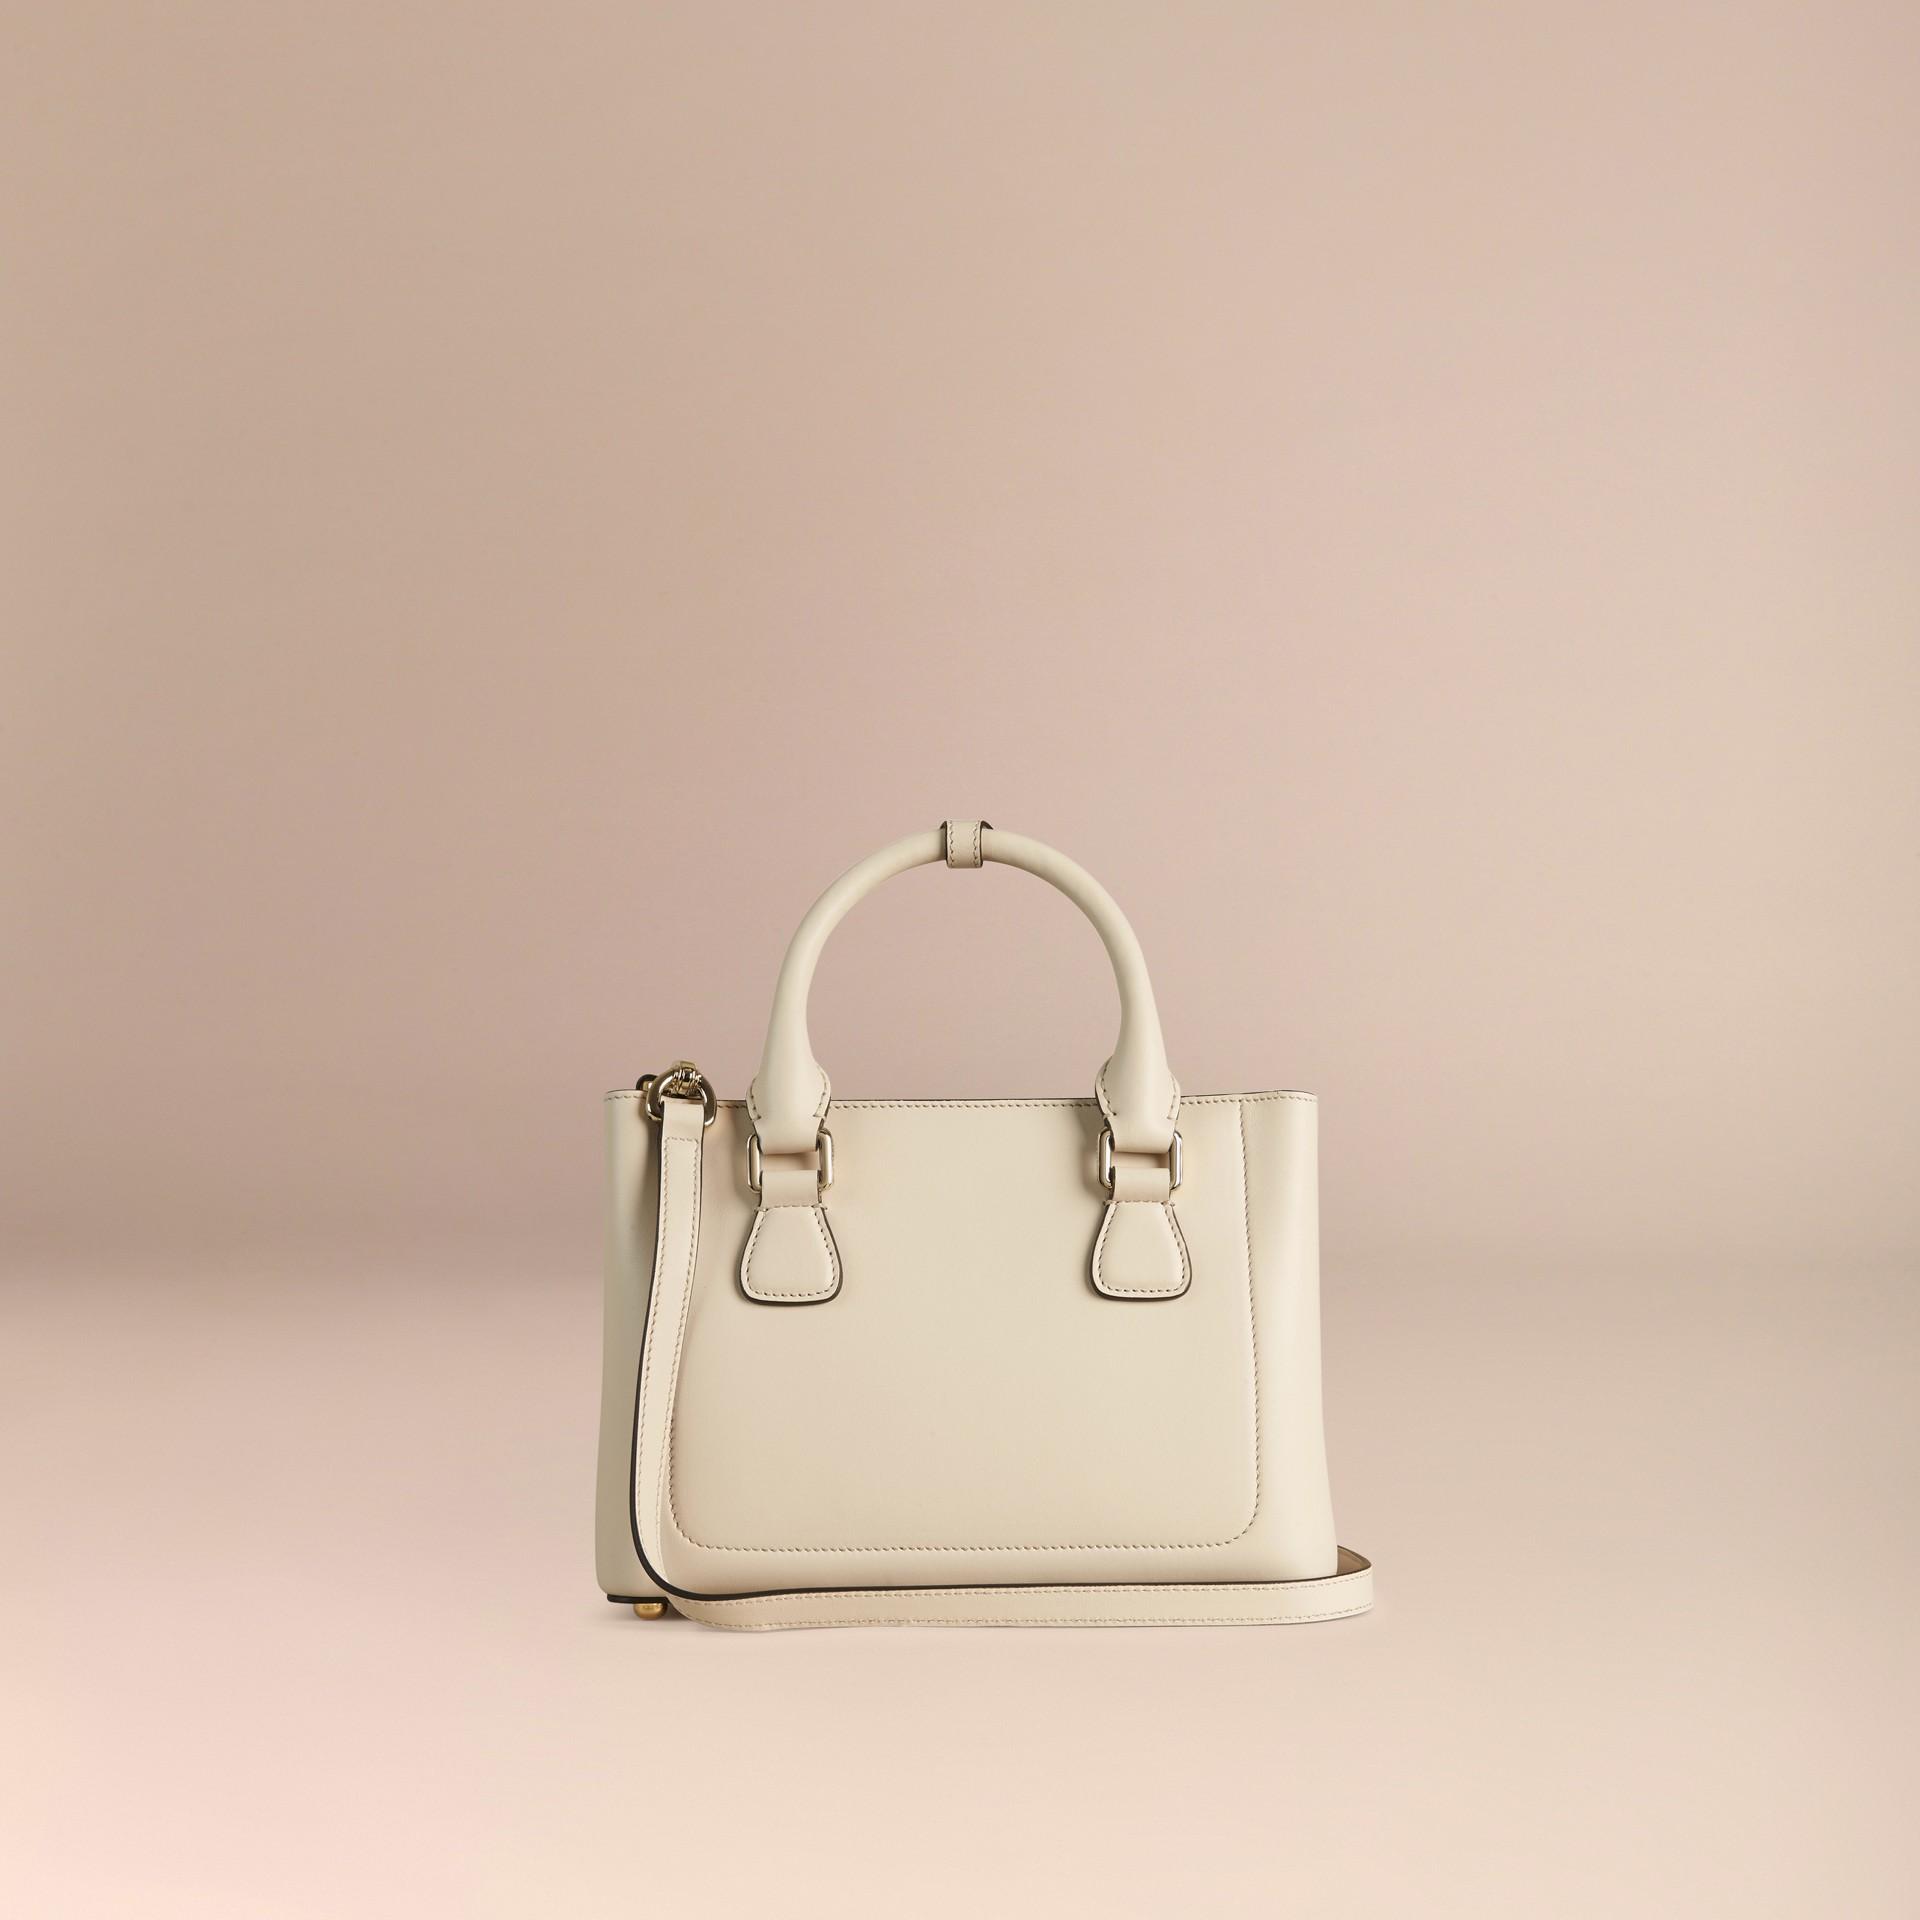 Steinfarben The Small Saddle Bag aus Glattleder und Pythonleder - Galerie-Bild 4